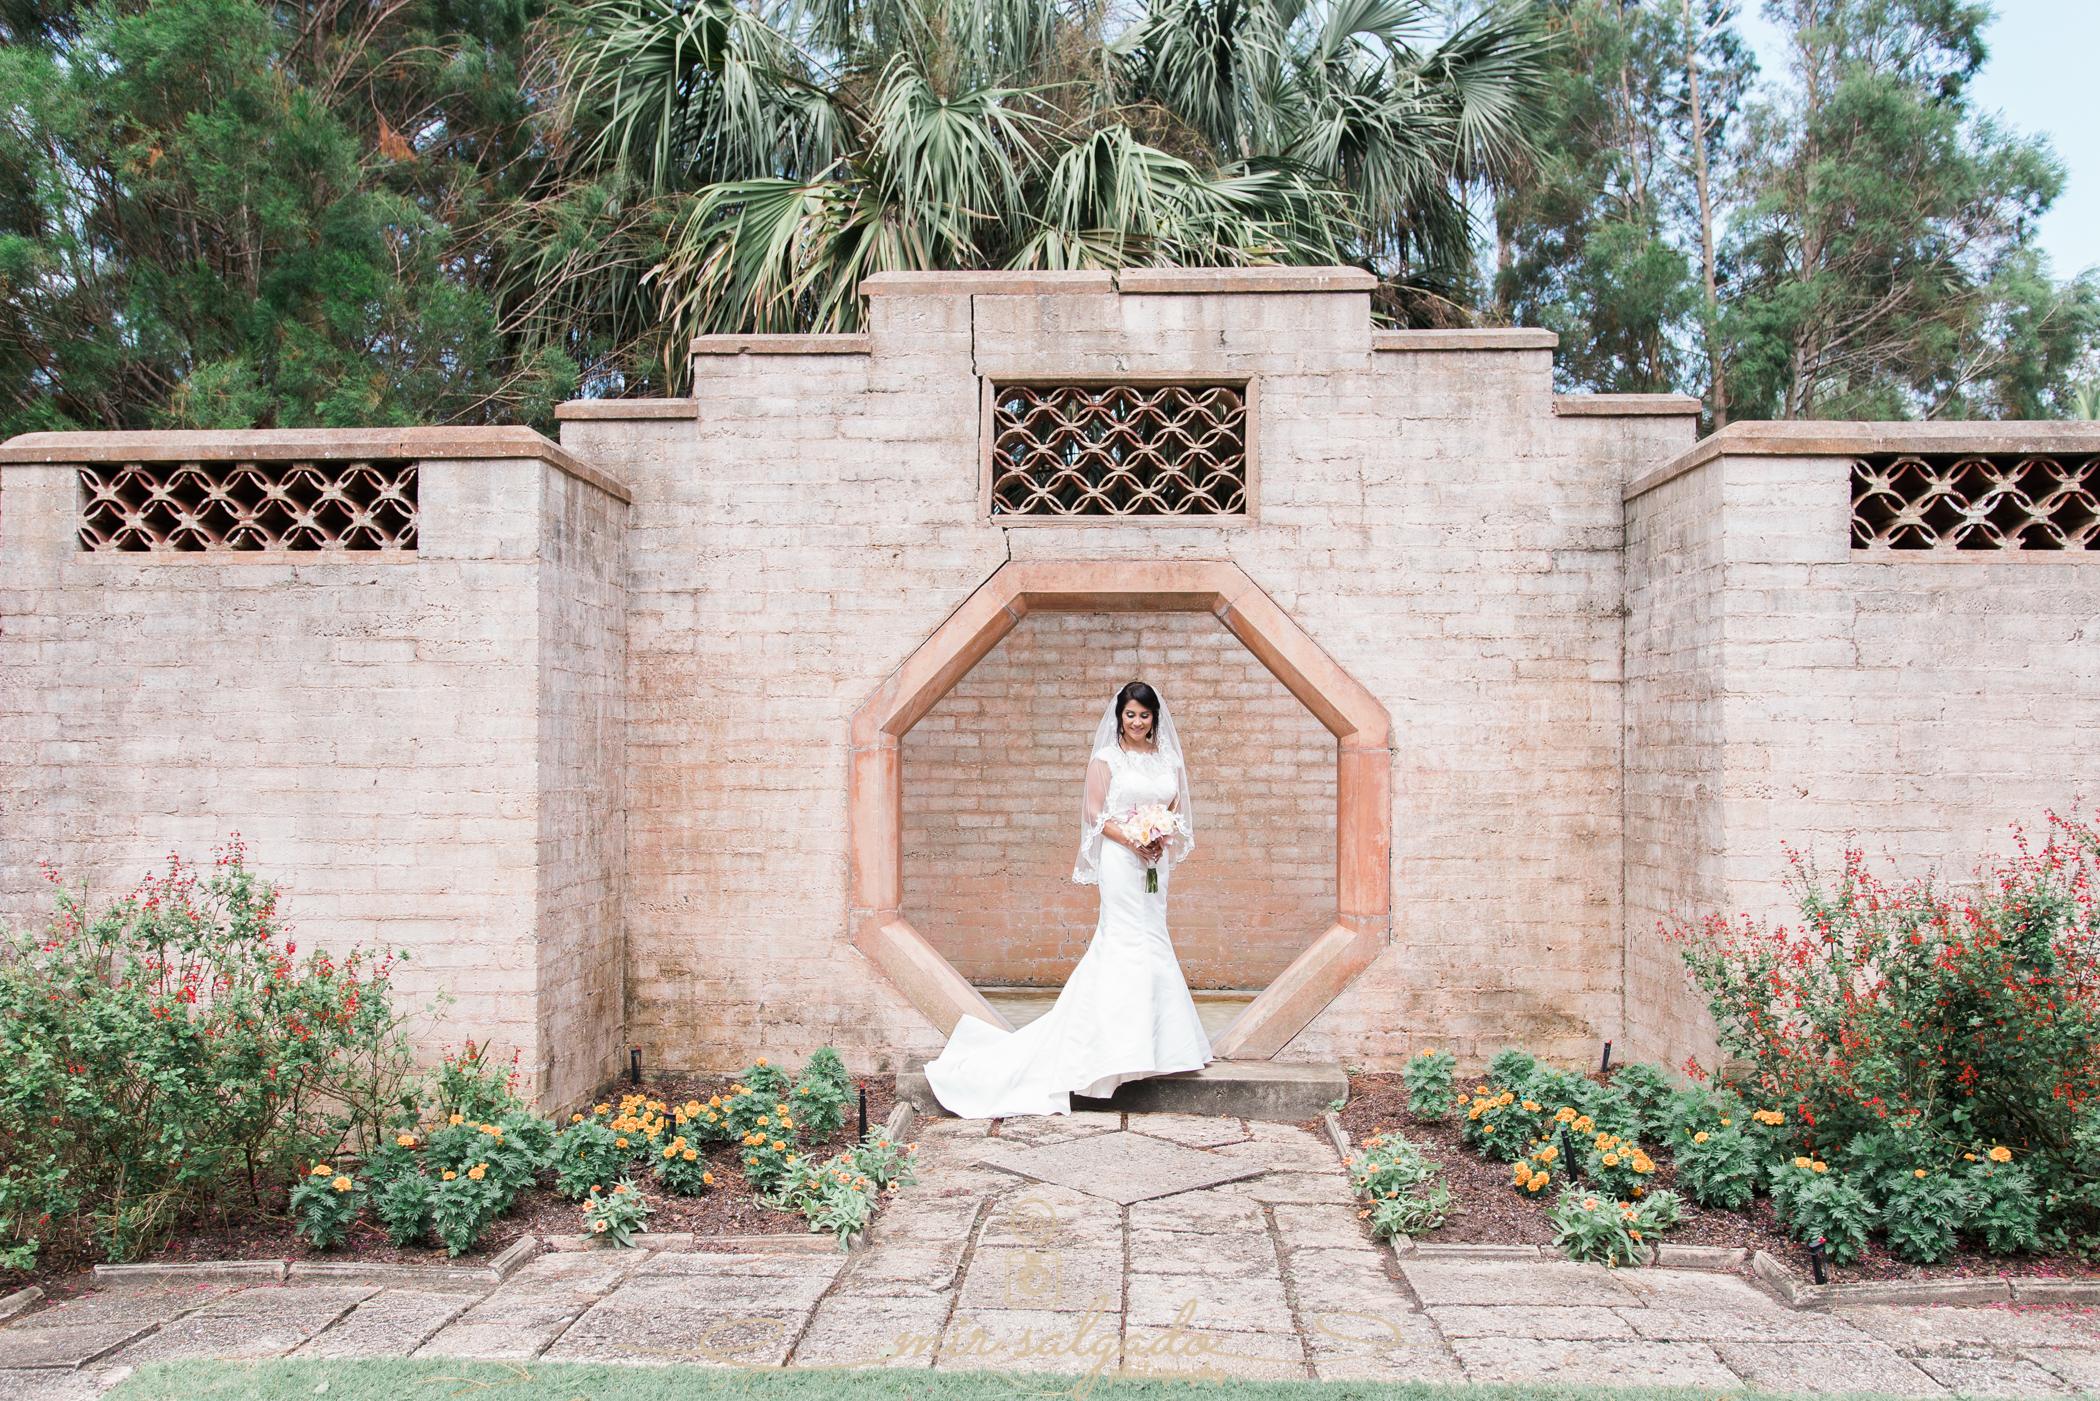 bride-and-groom-portrait, Bok-tower-gardens-wedding-day